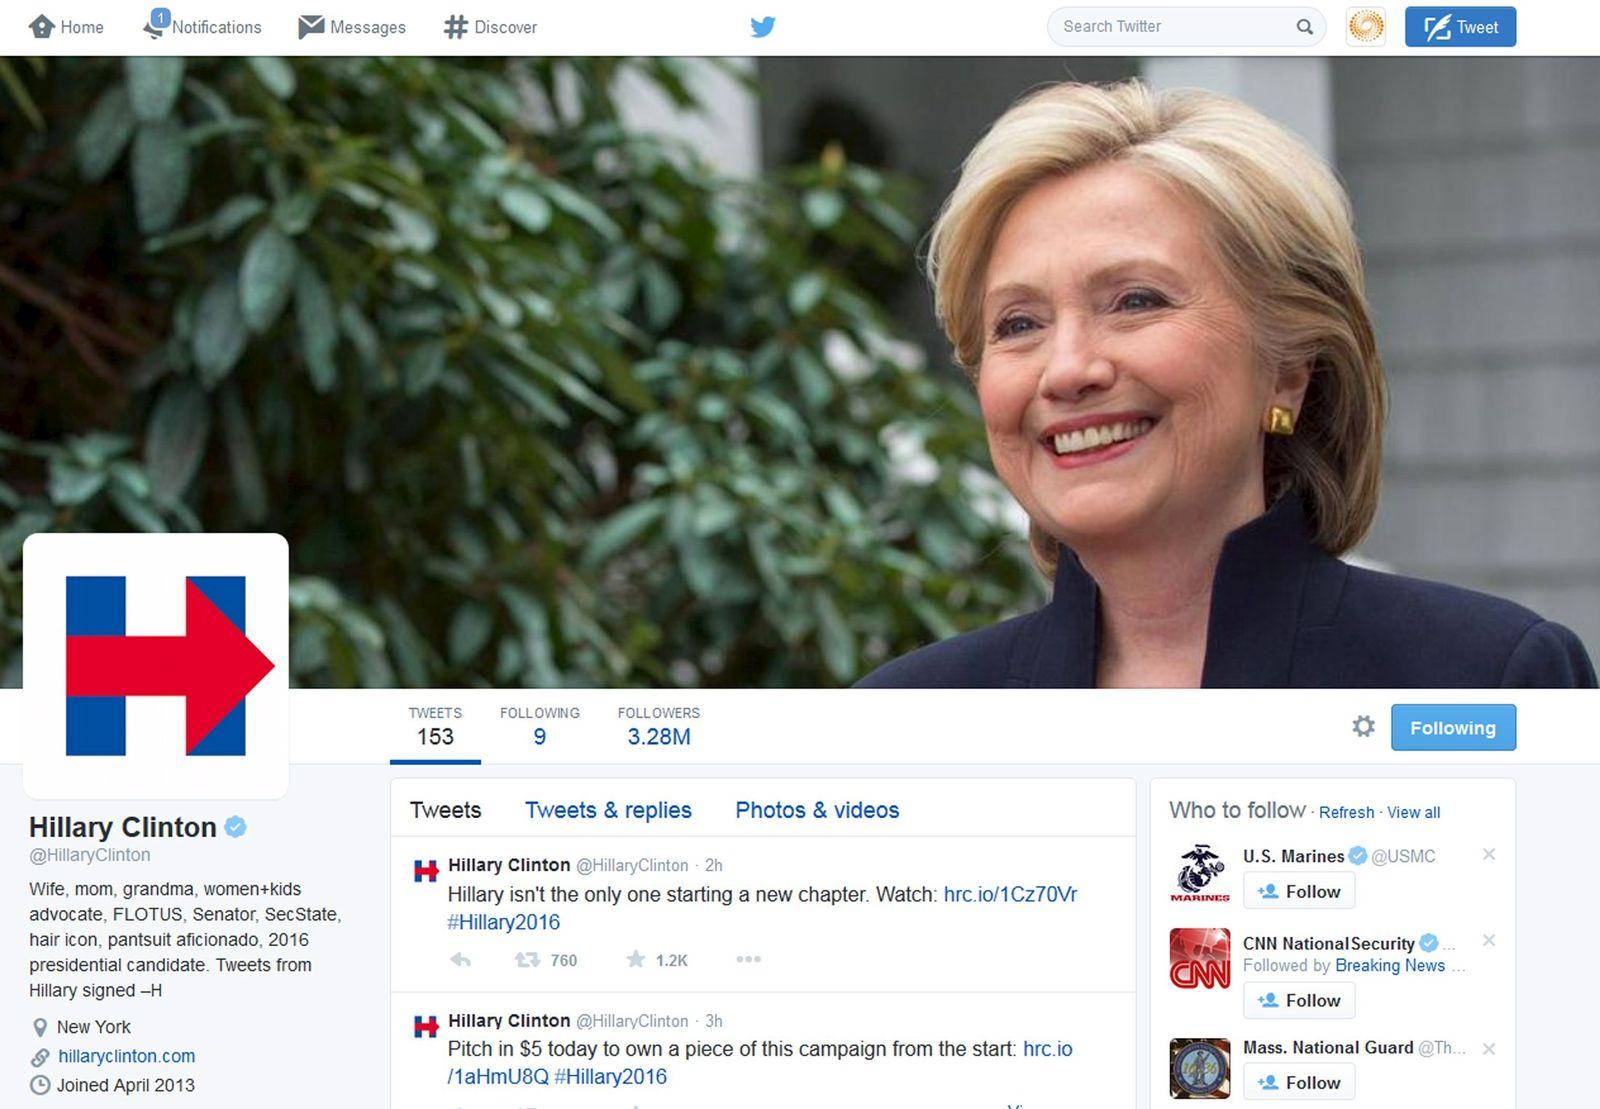 Hillary Clinton/Logo